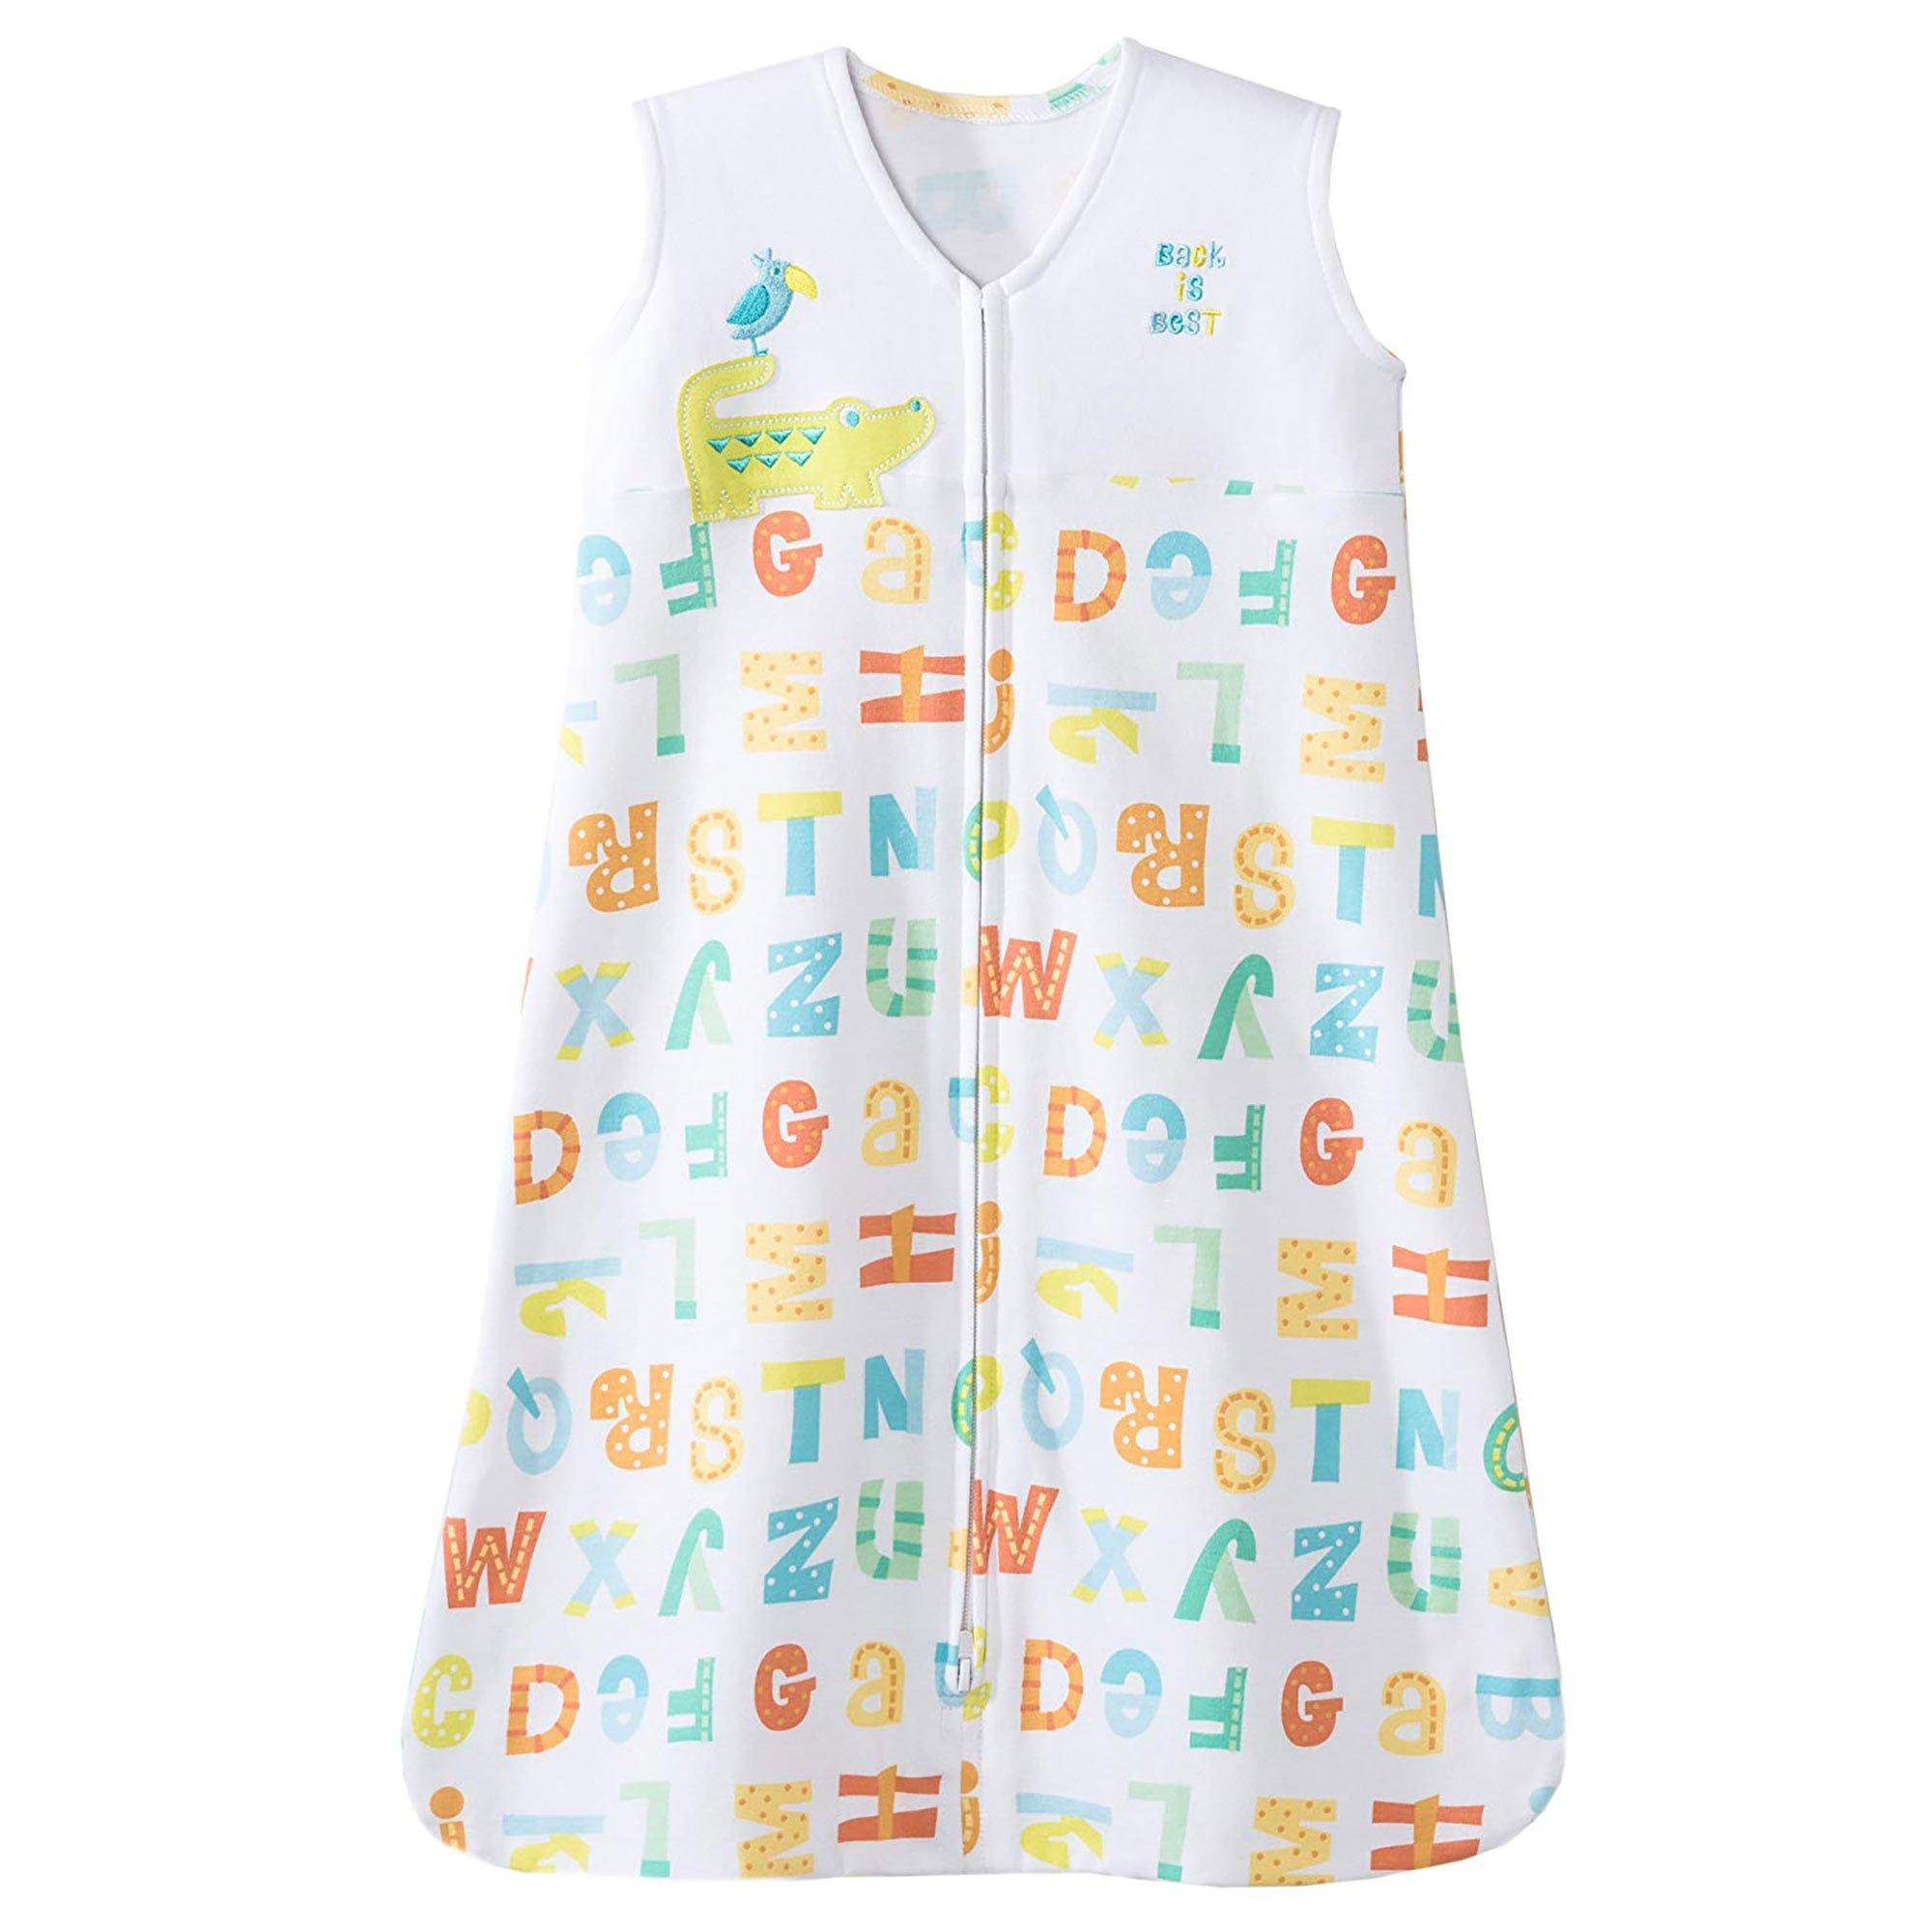 HALO Sleepsack 100% Cotton Wearable Blanket, Yellow Alphabet Pals, Large